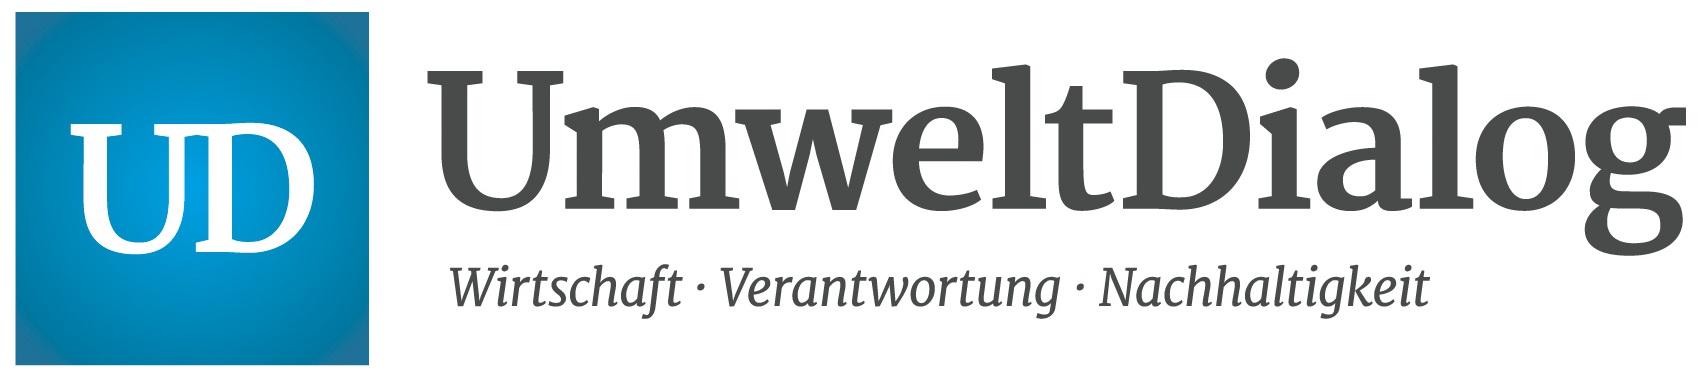 https://www.csr-jobs.de/wp-content/uploads/2017/04/UD-Logo-RGB-Standard_Online.jpg